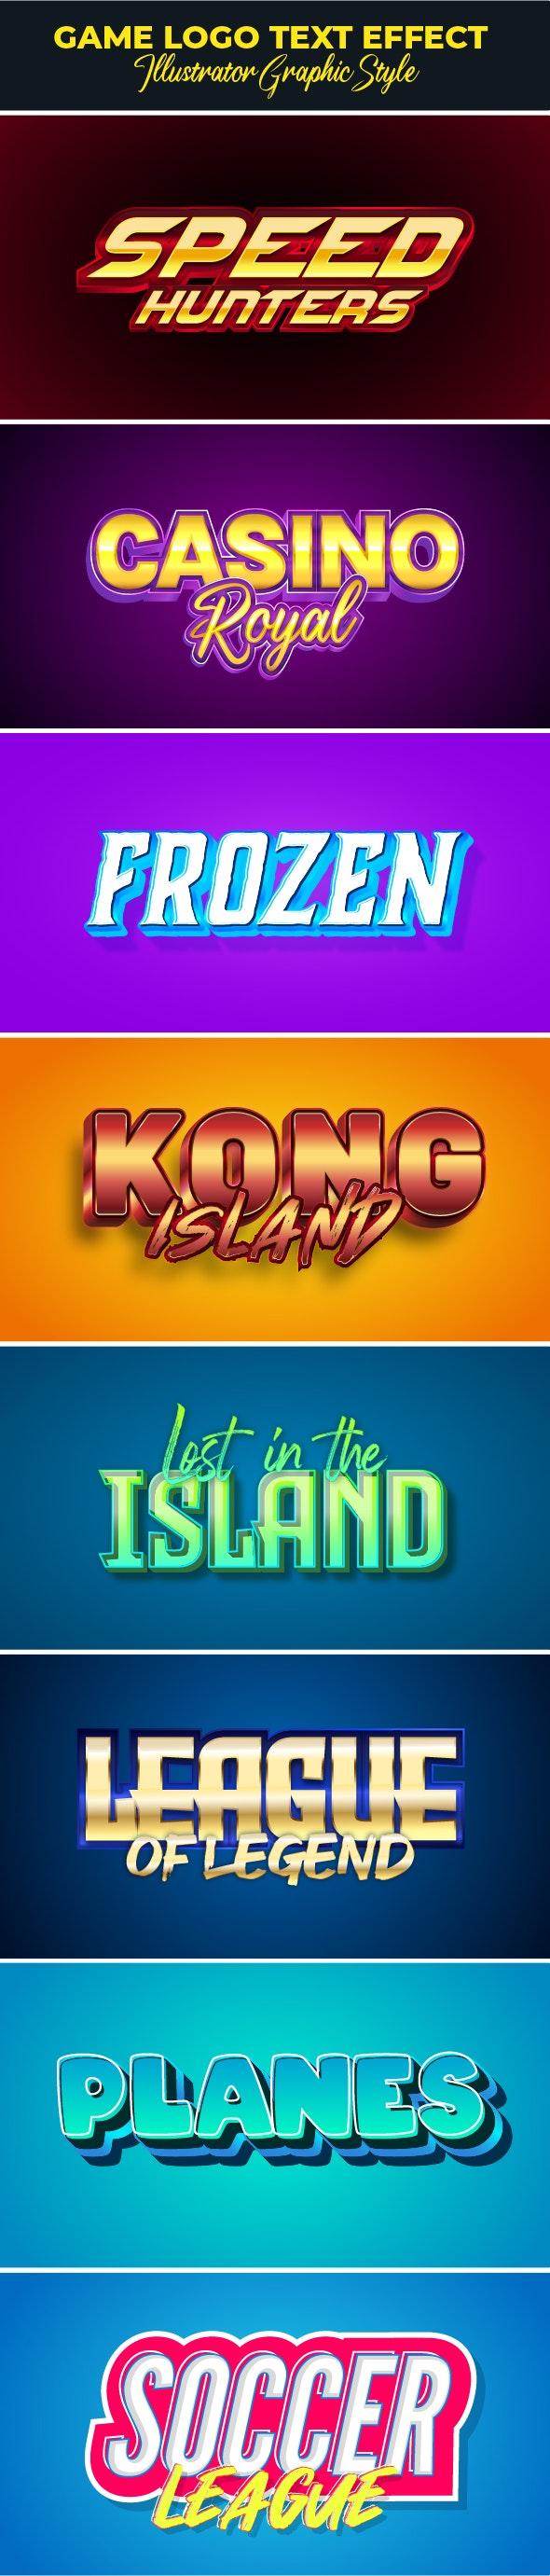 Modern Game Logo Text Effect - Styles Illustrator